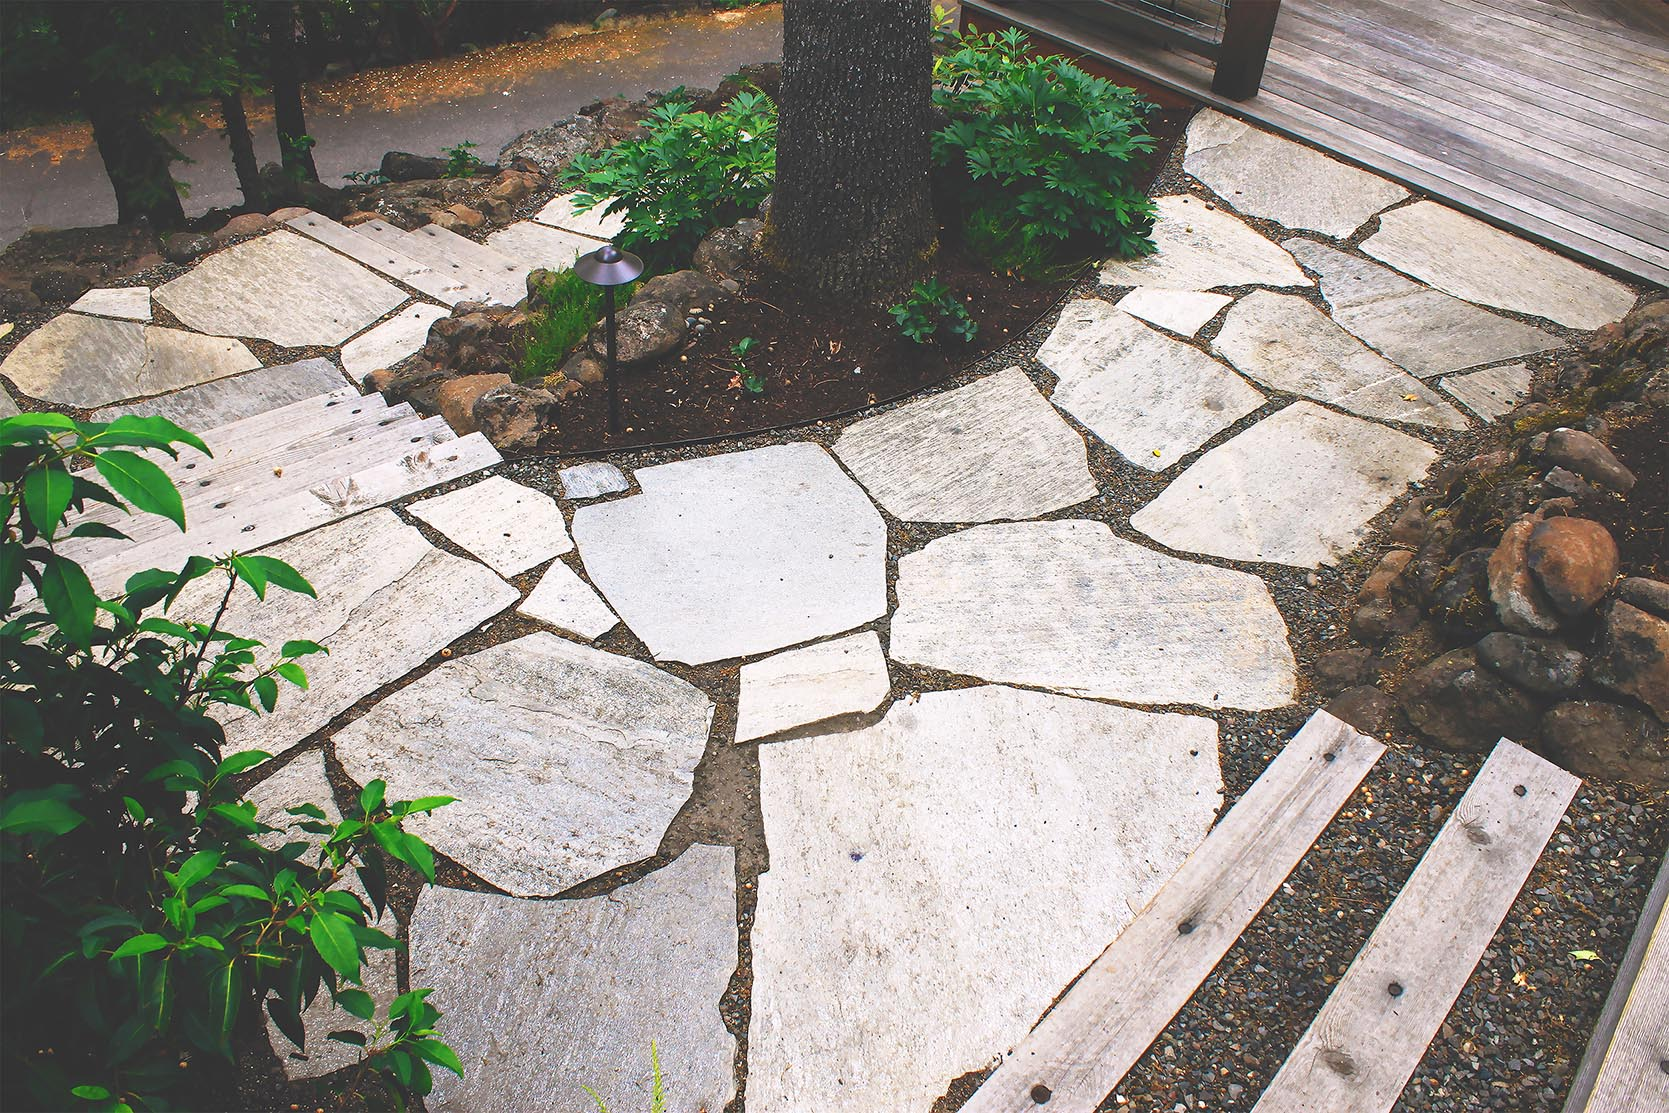 Loose Fit Flagstone Path + Timber + Gravel Steps + Deer-Resistant Perennial